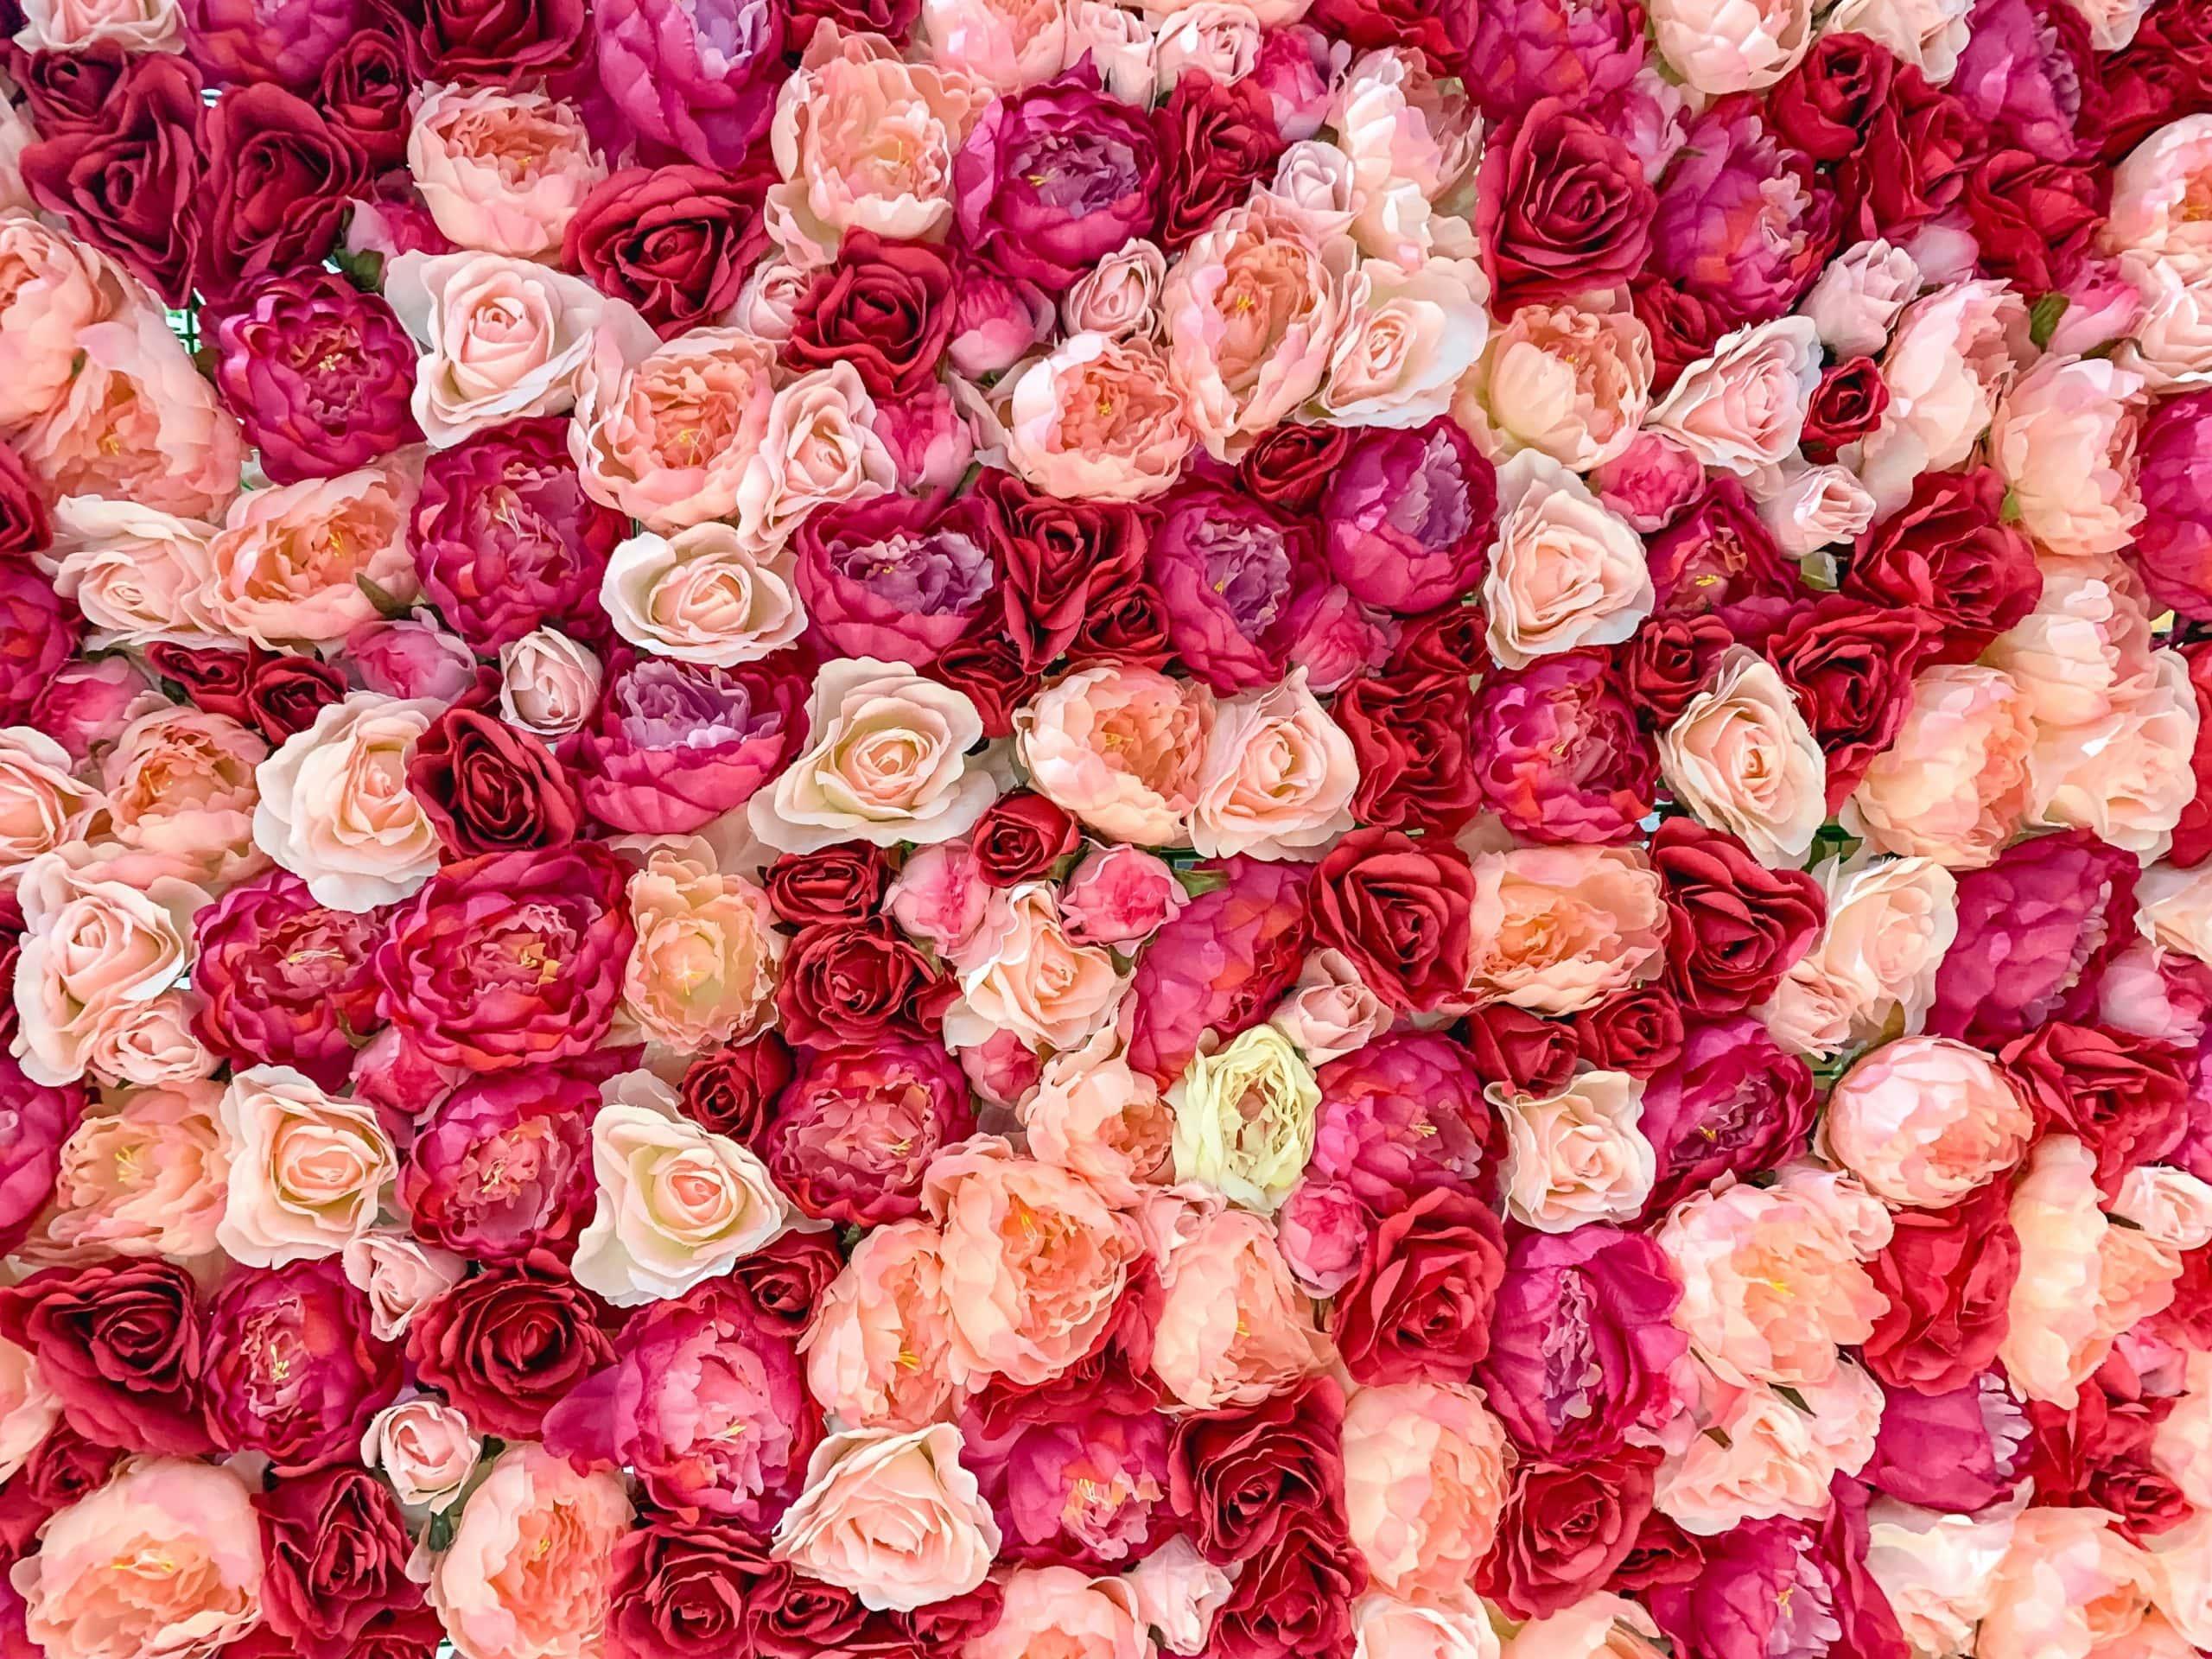 29 Loving Valentine's Day Gifts in 2021